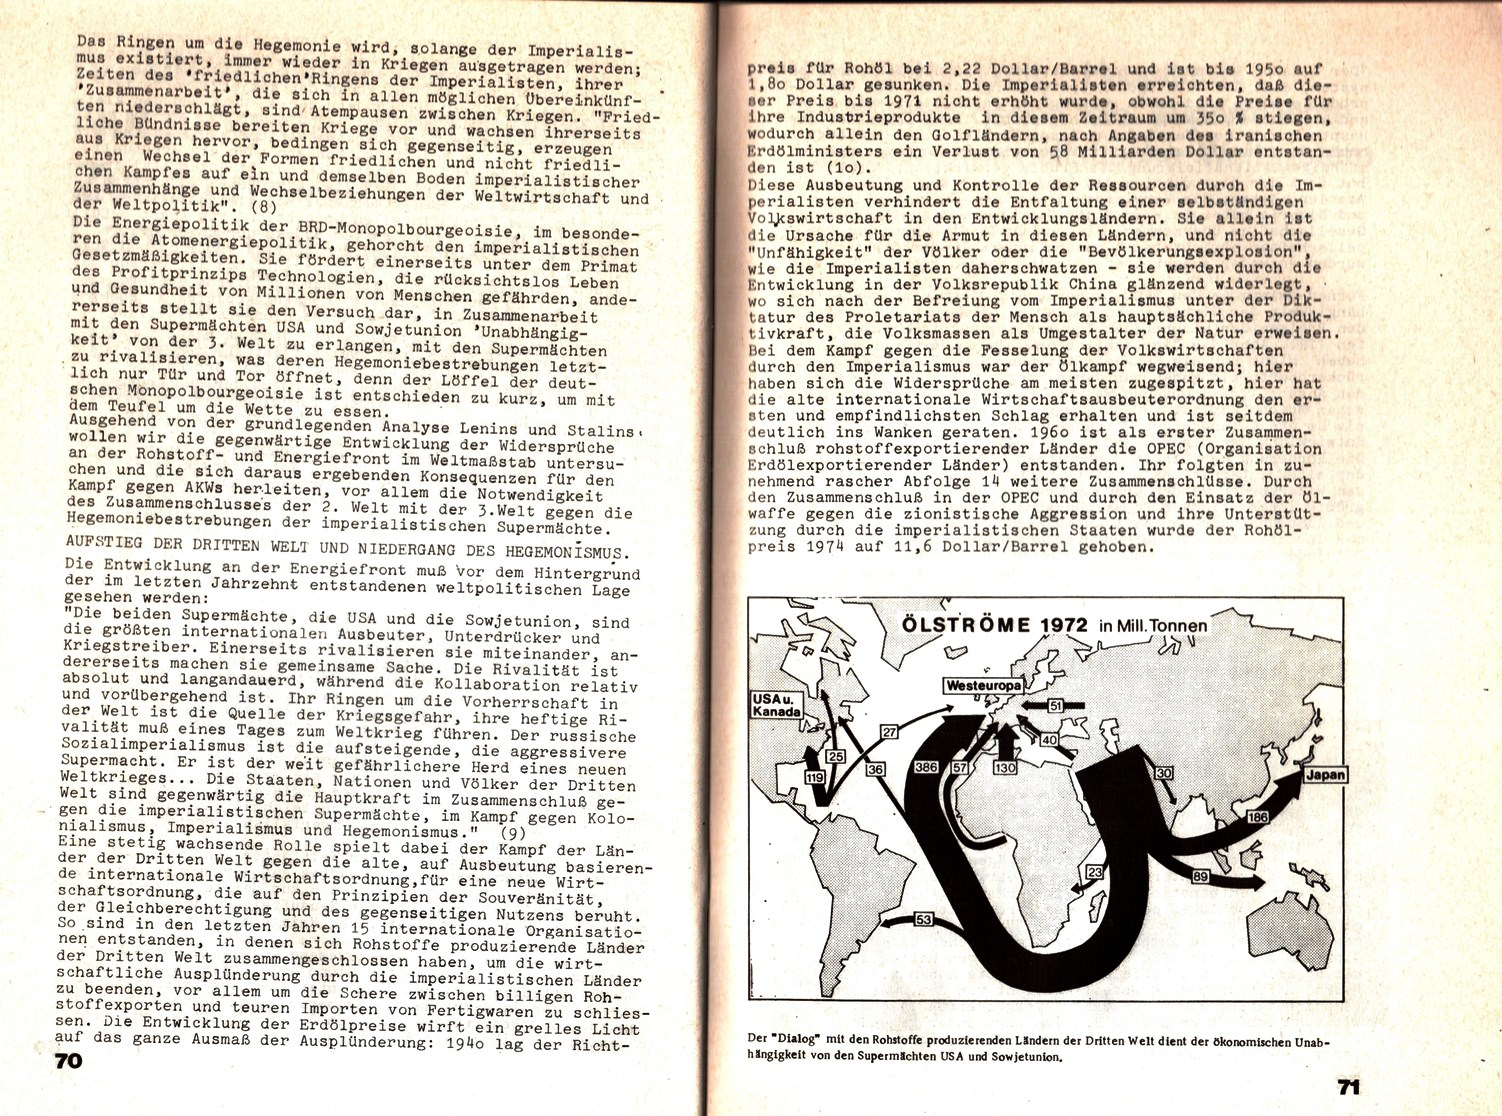 KSV_1976_Atomenergie_im_Kapitalismus_037